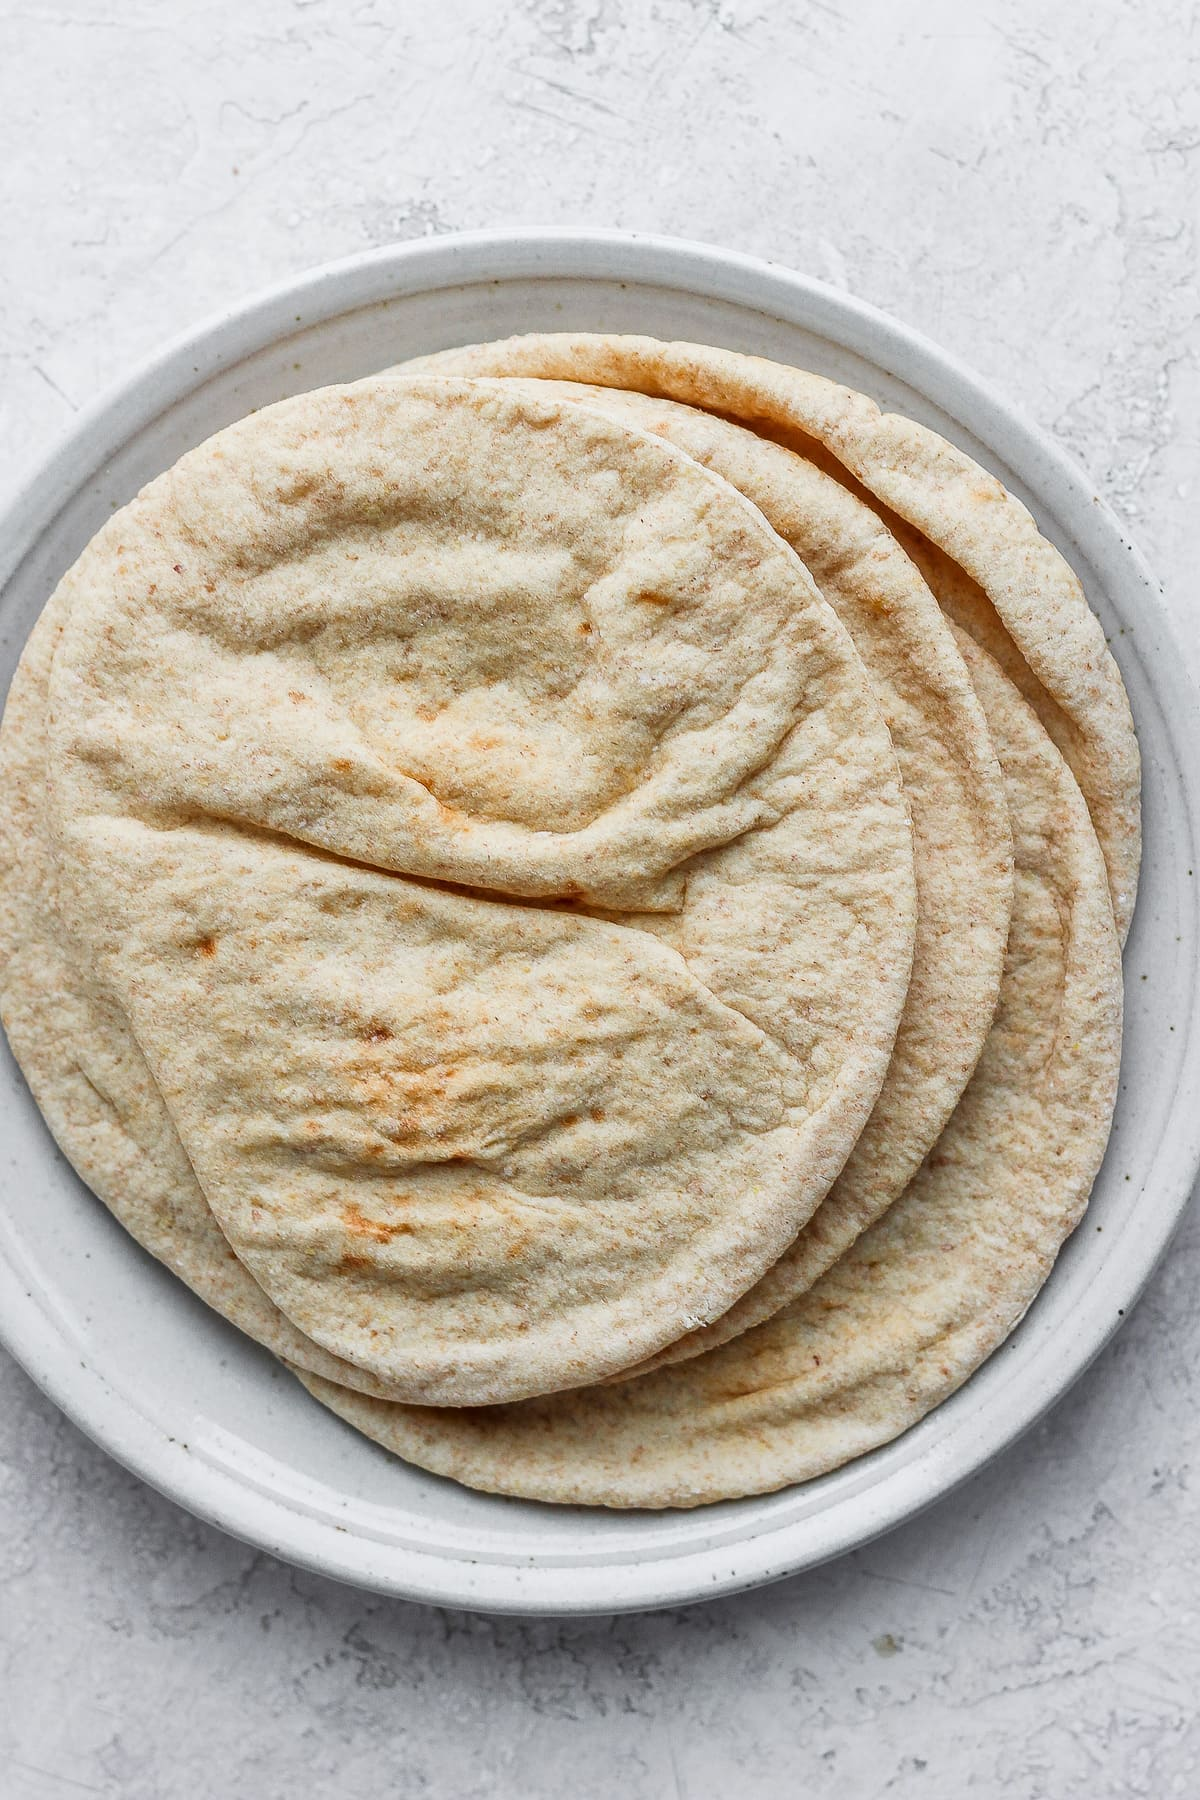 A plate of pita bread.